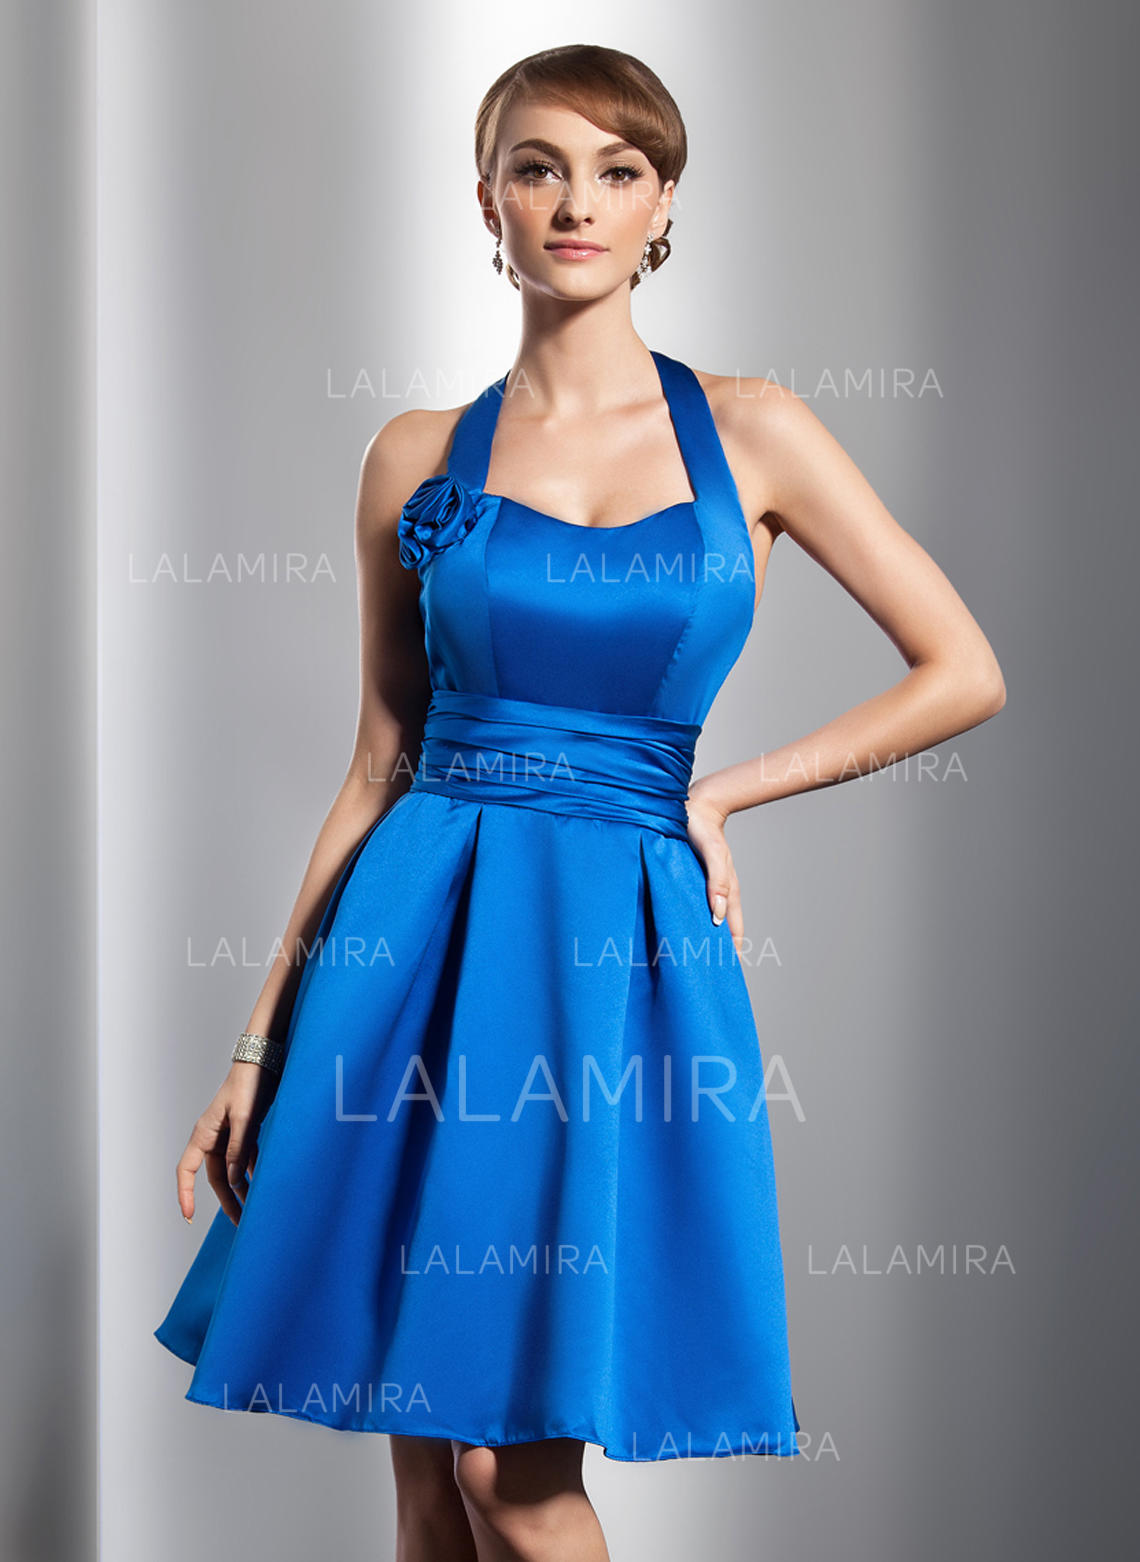 fe003c56aa4 A-Line Princess Knee-Length Homecoming Dresses Halter Satin Sleeveless  (022213992). Loading zoom